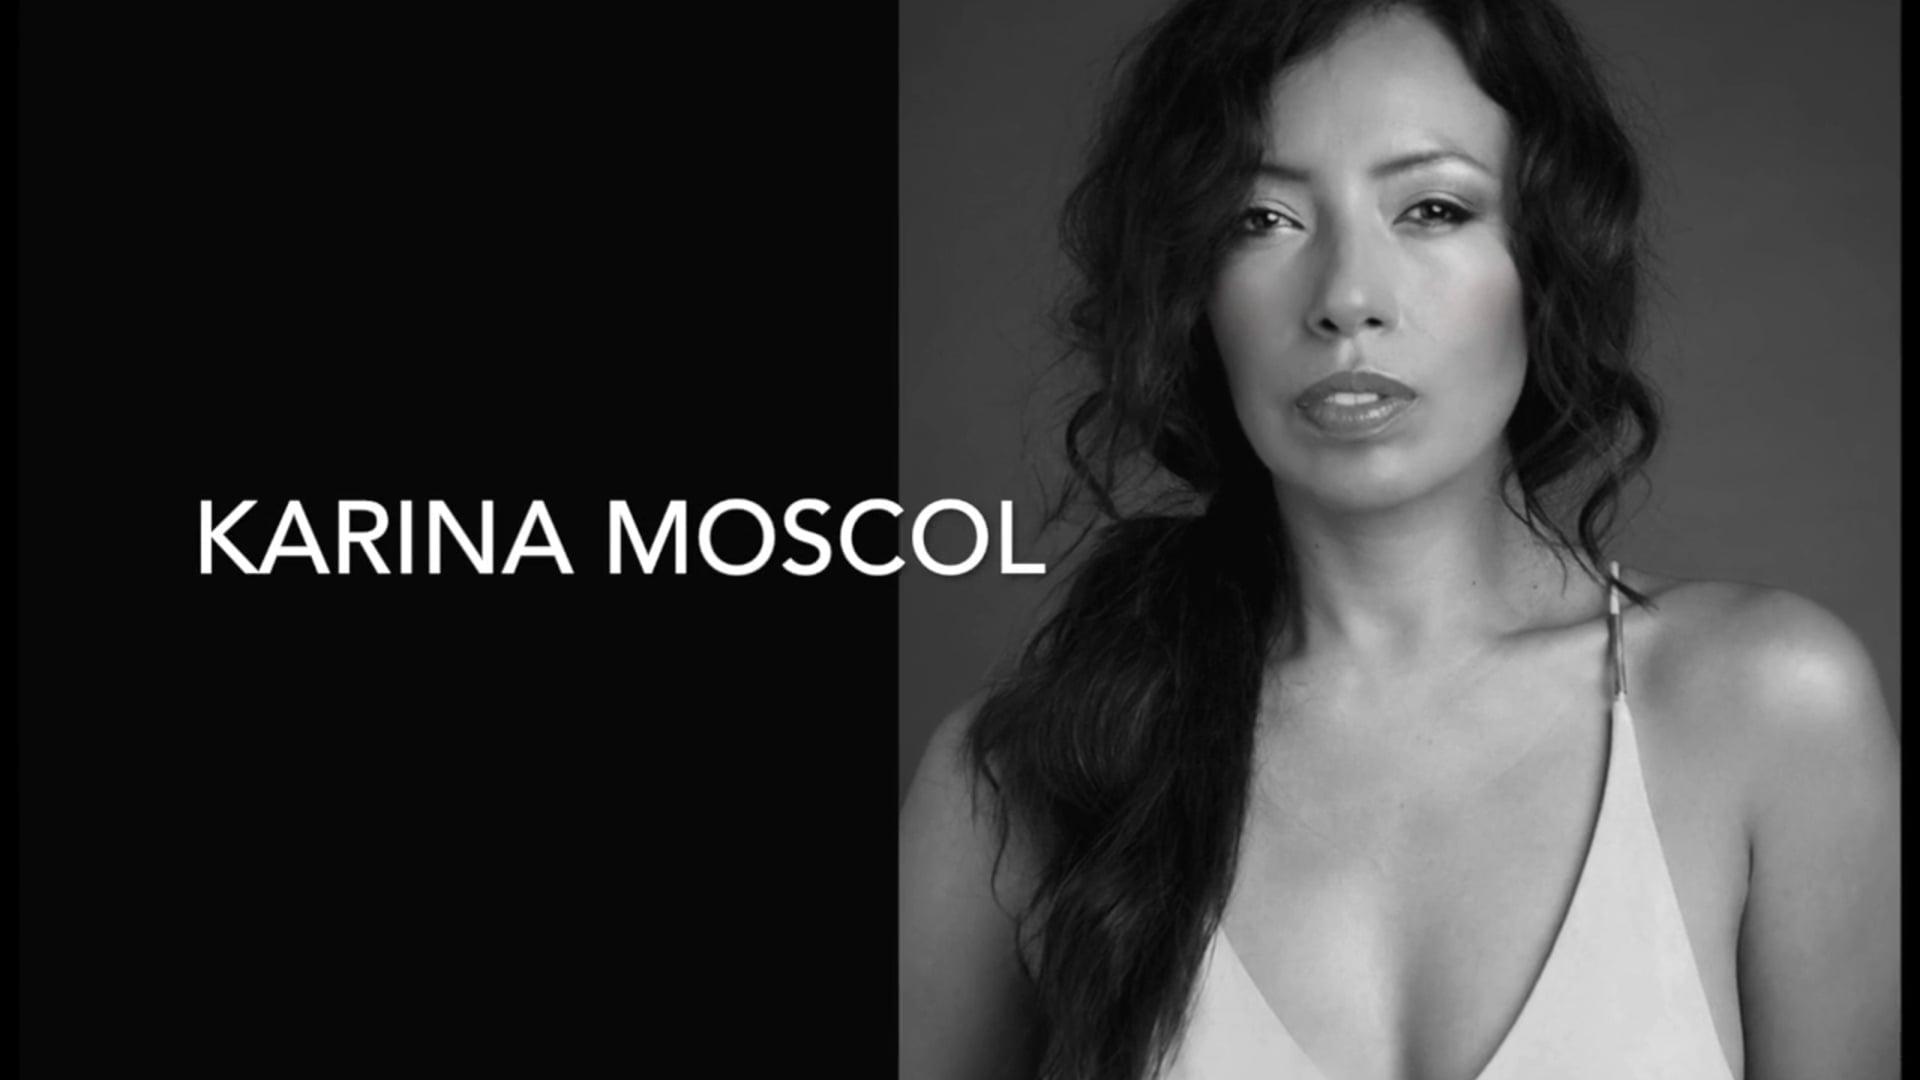 Karina Moscol - Actriz  -Reel  2021